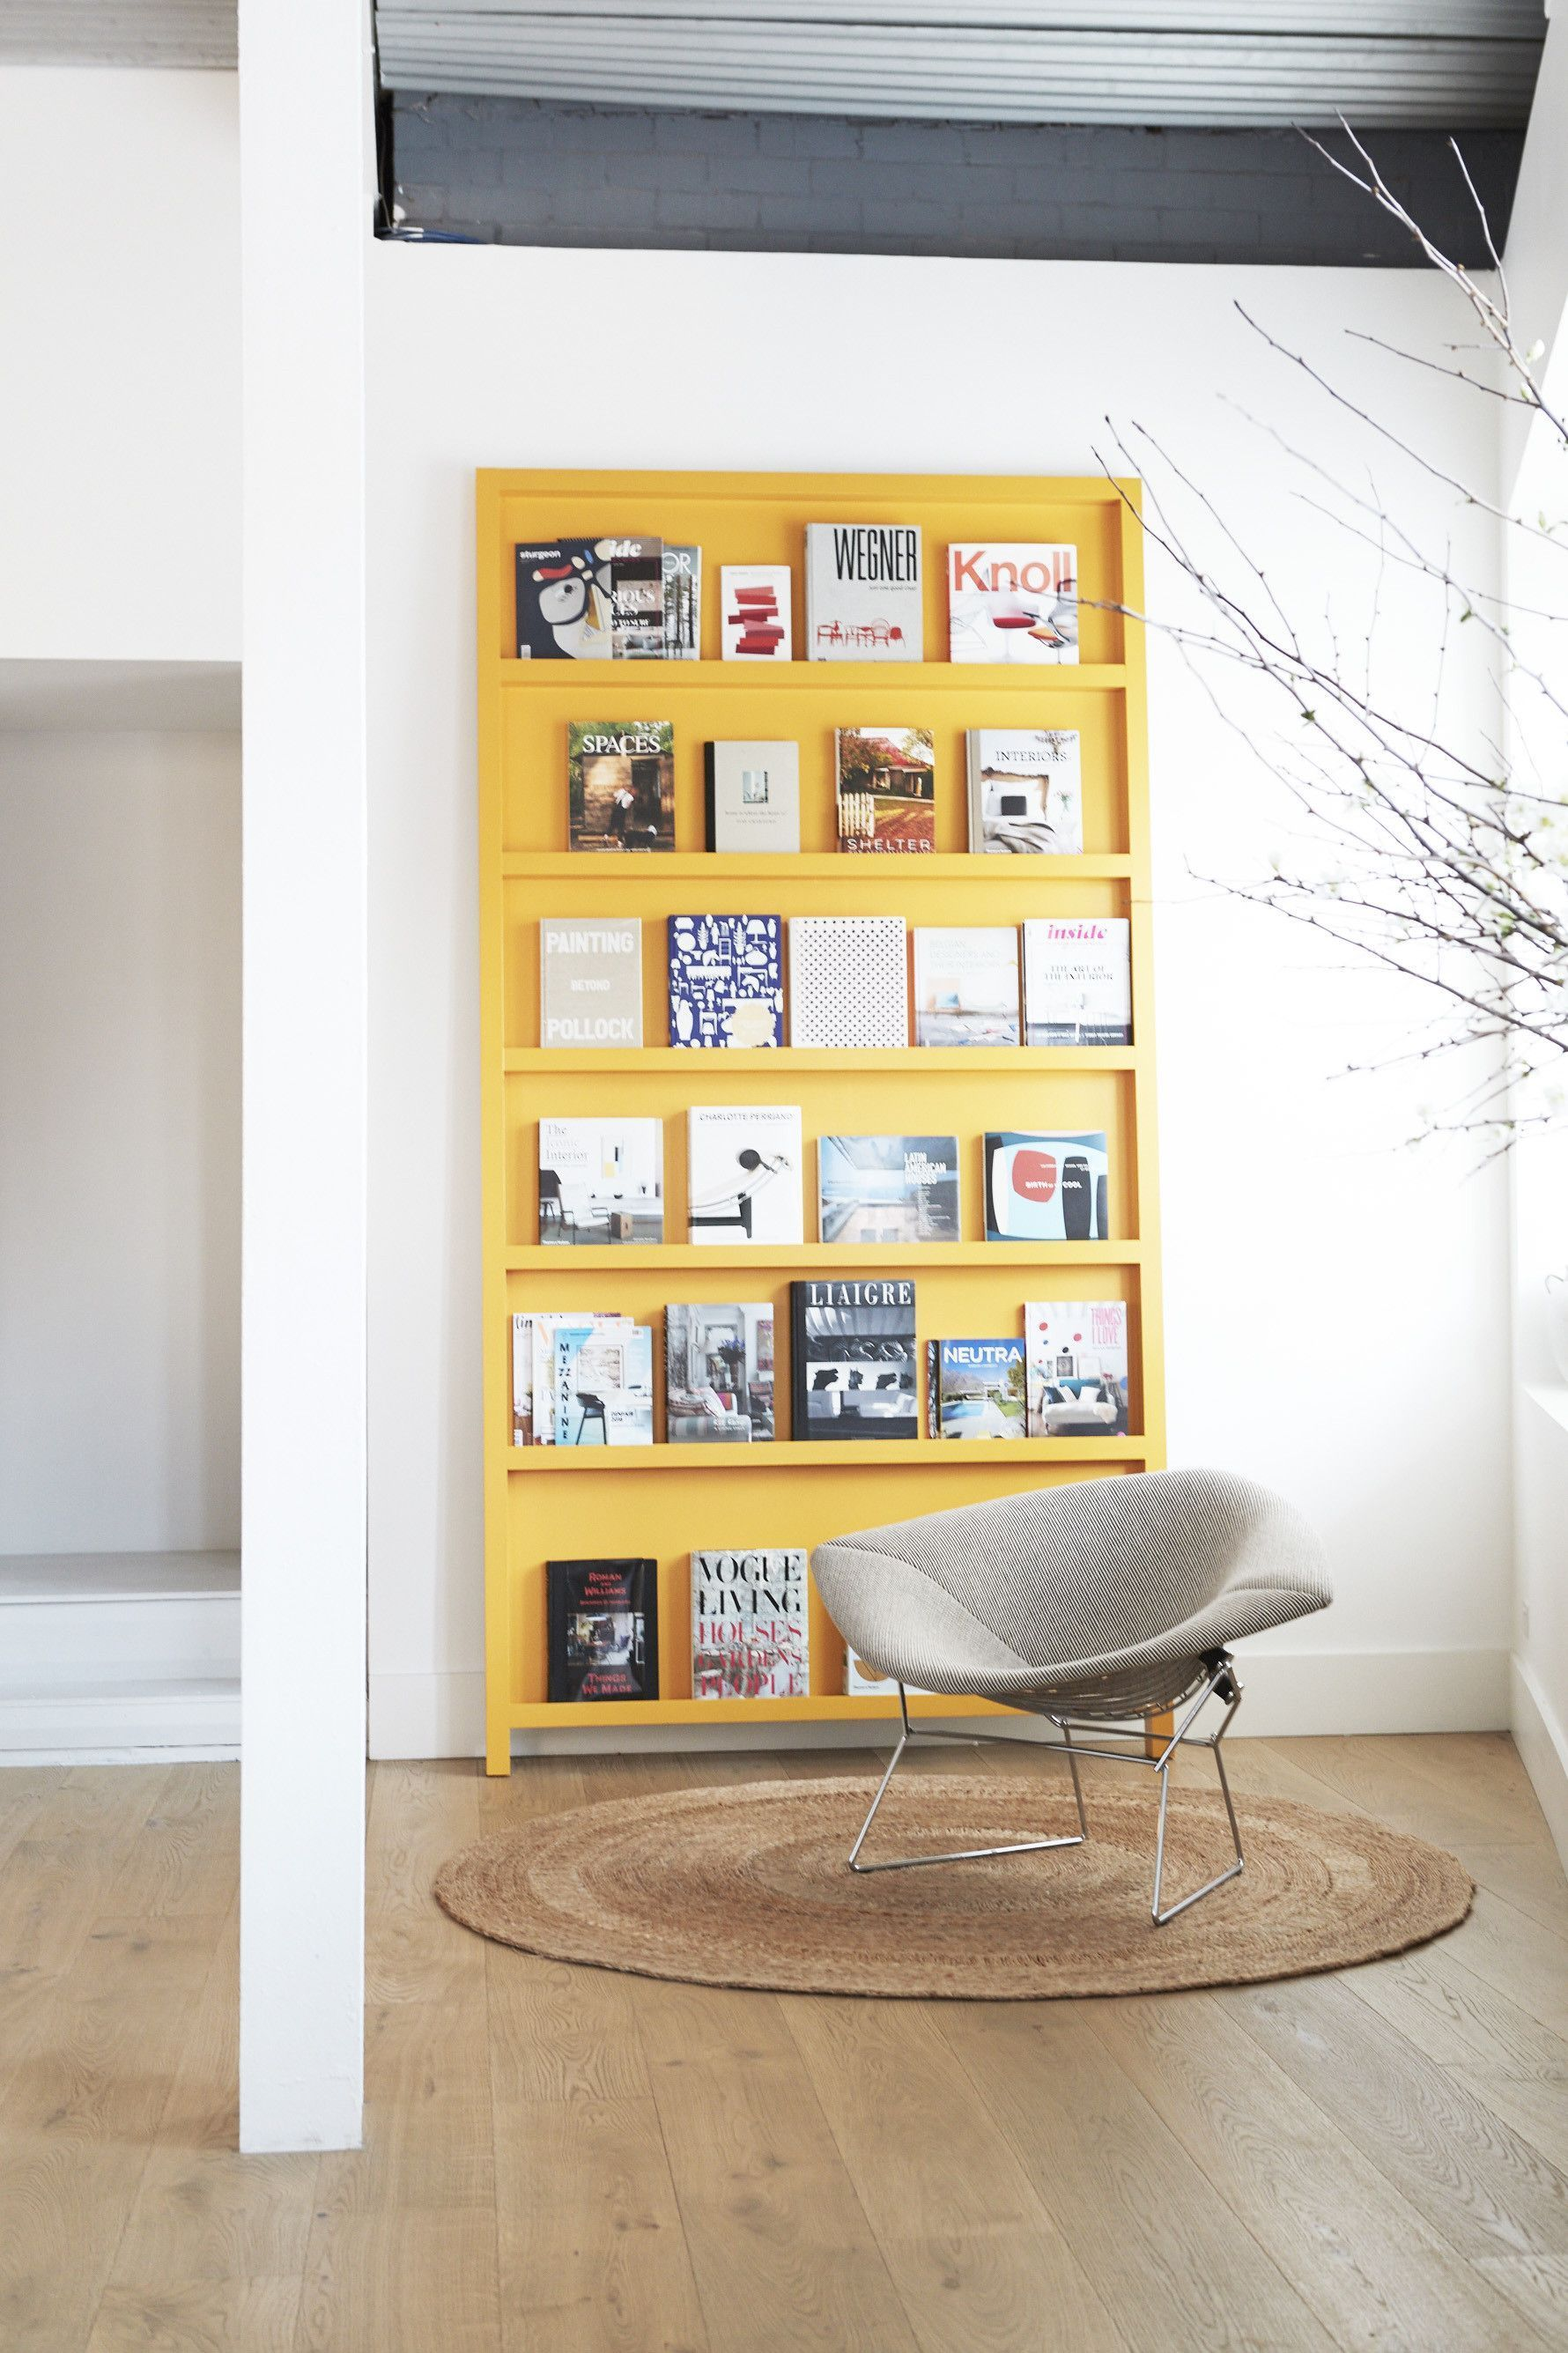 images free bookshelf yellow literature en library books furniture university education specialist book photo shelf color design programming